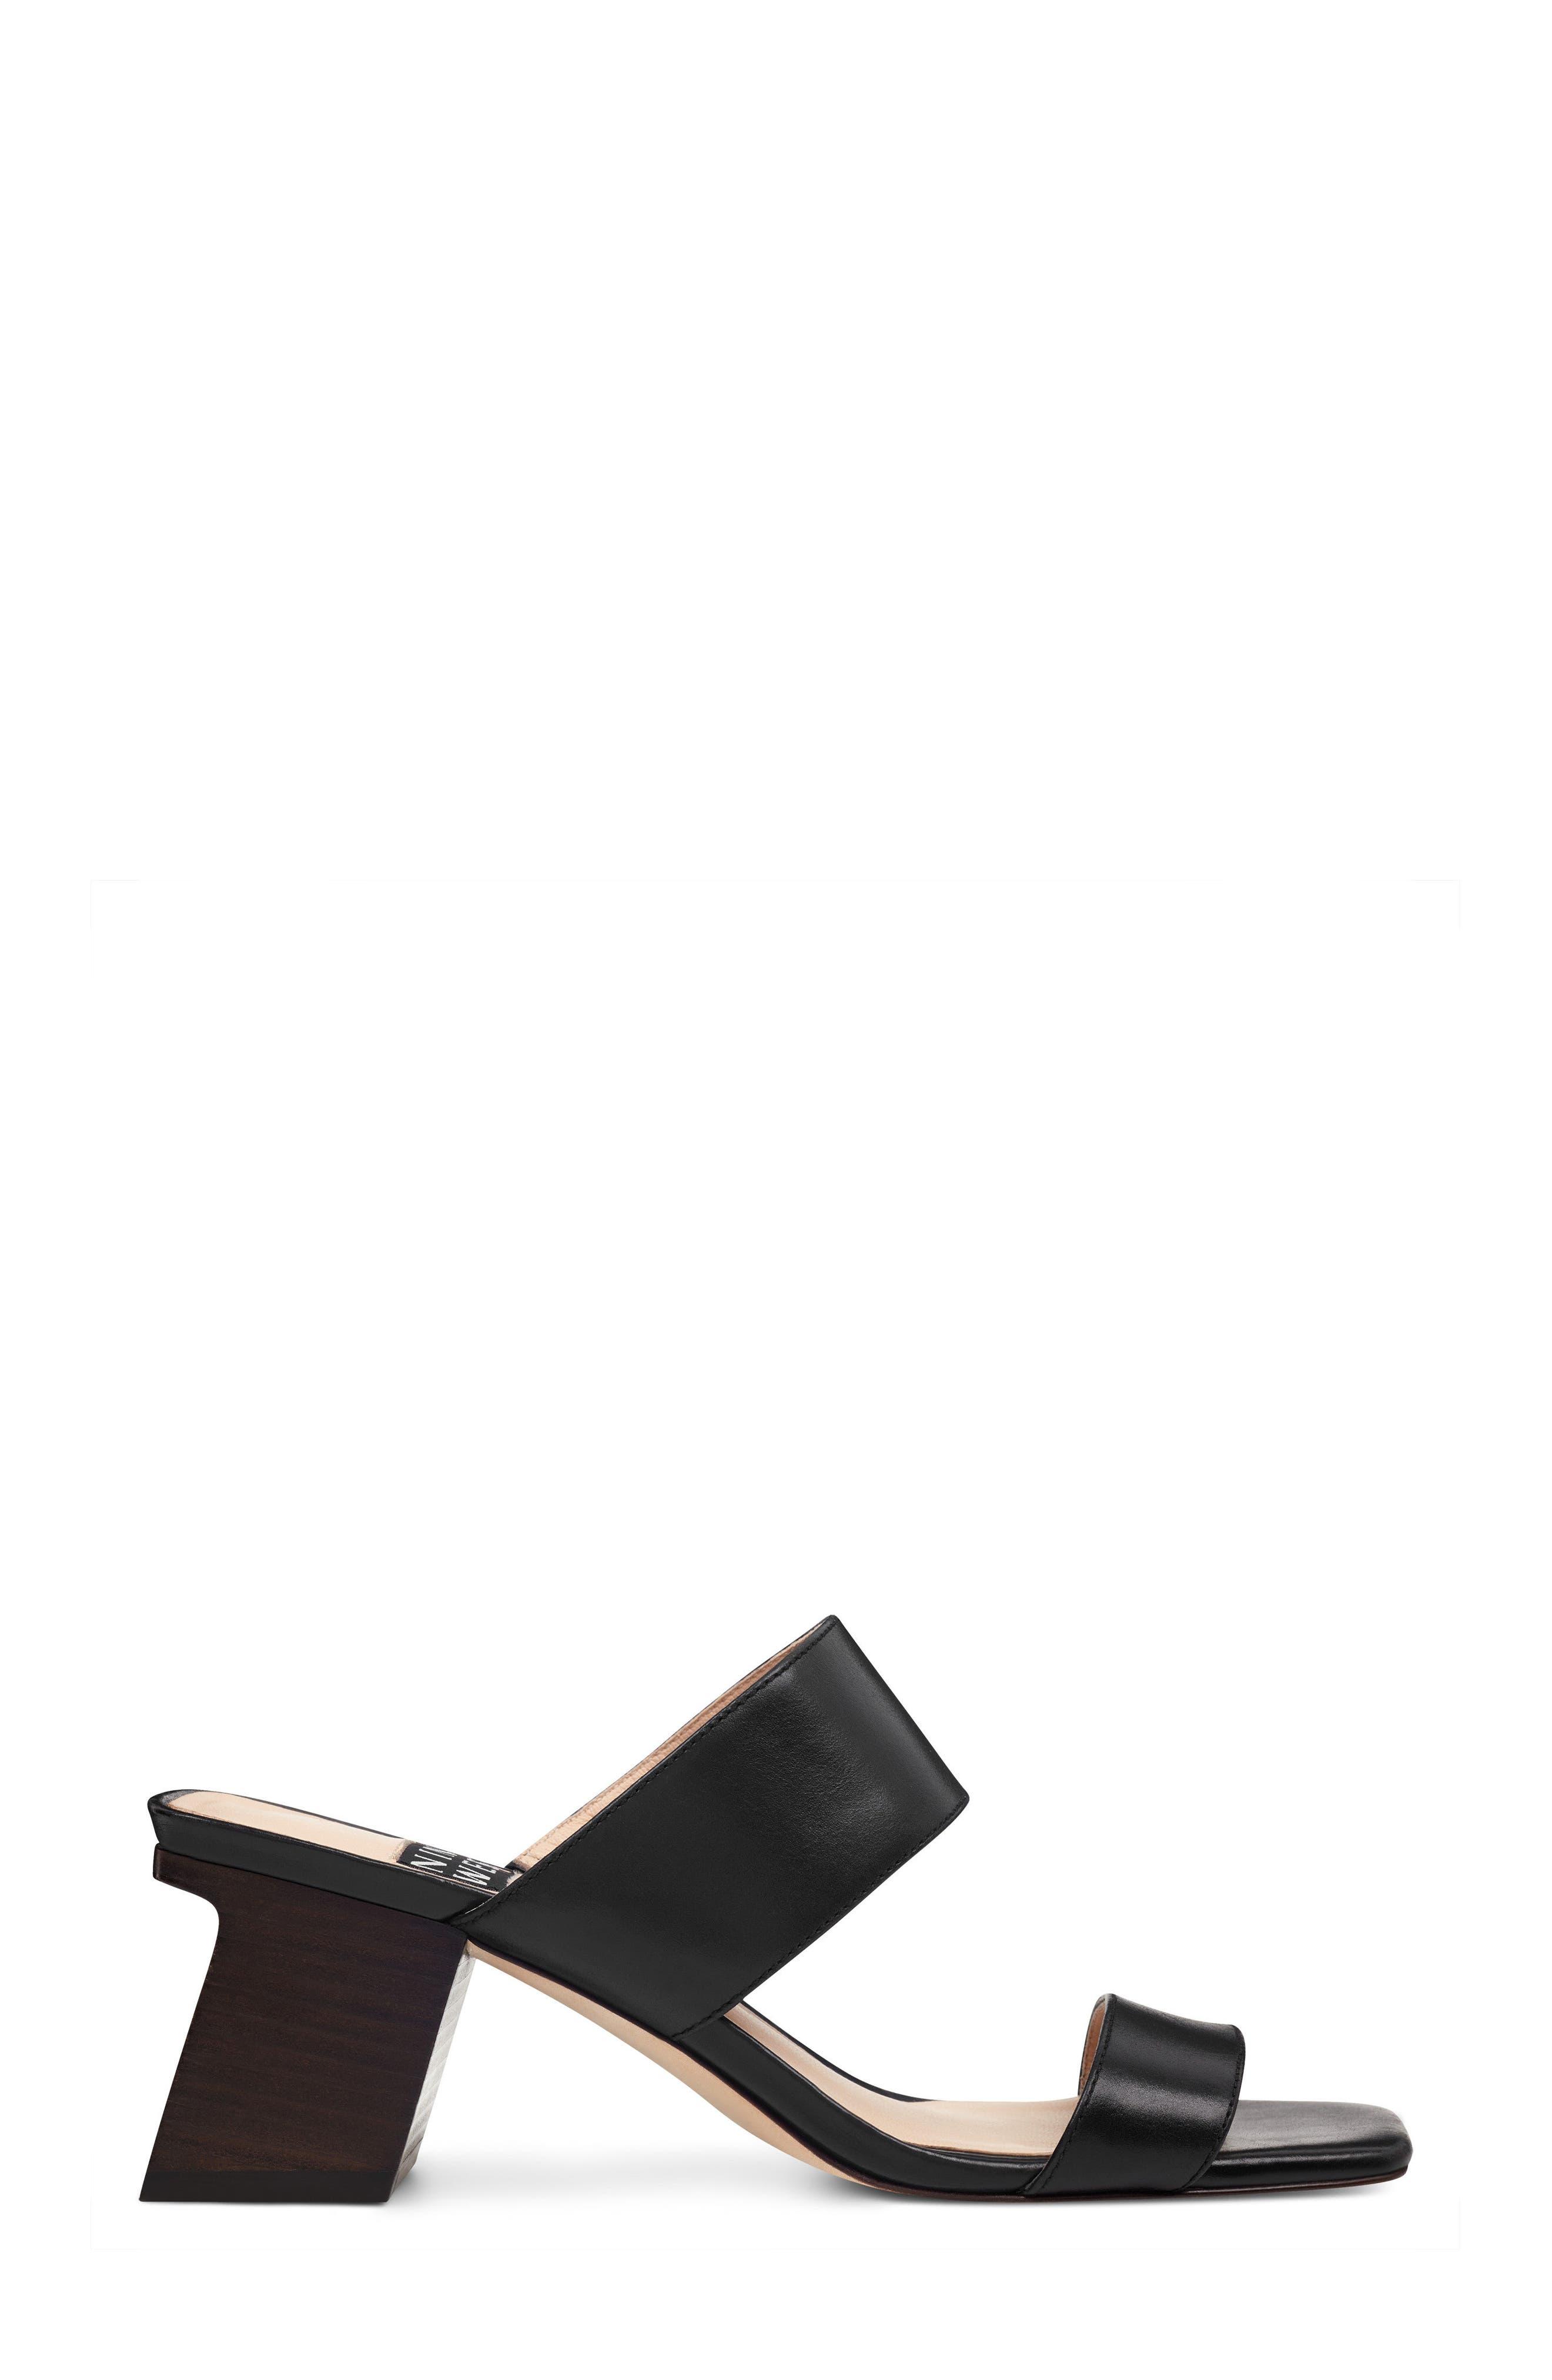 Churen - 40th Anniversary Capsule Collection Sandal,                             Alternate thumbnail 3, color,                             BLACK LEATHER